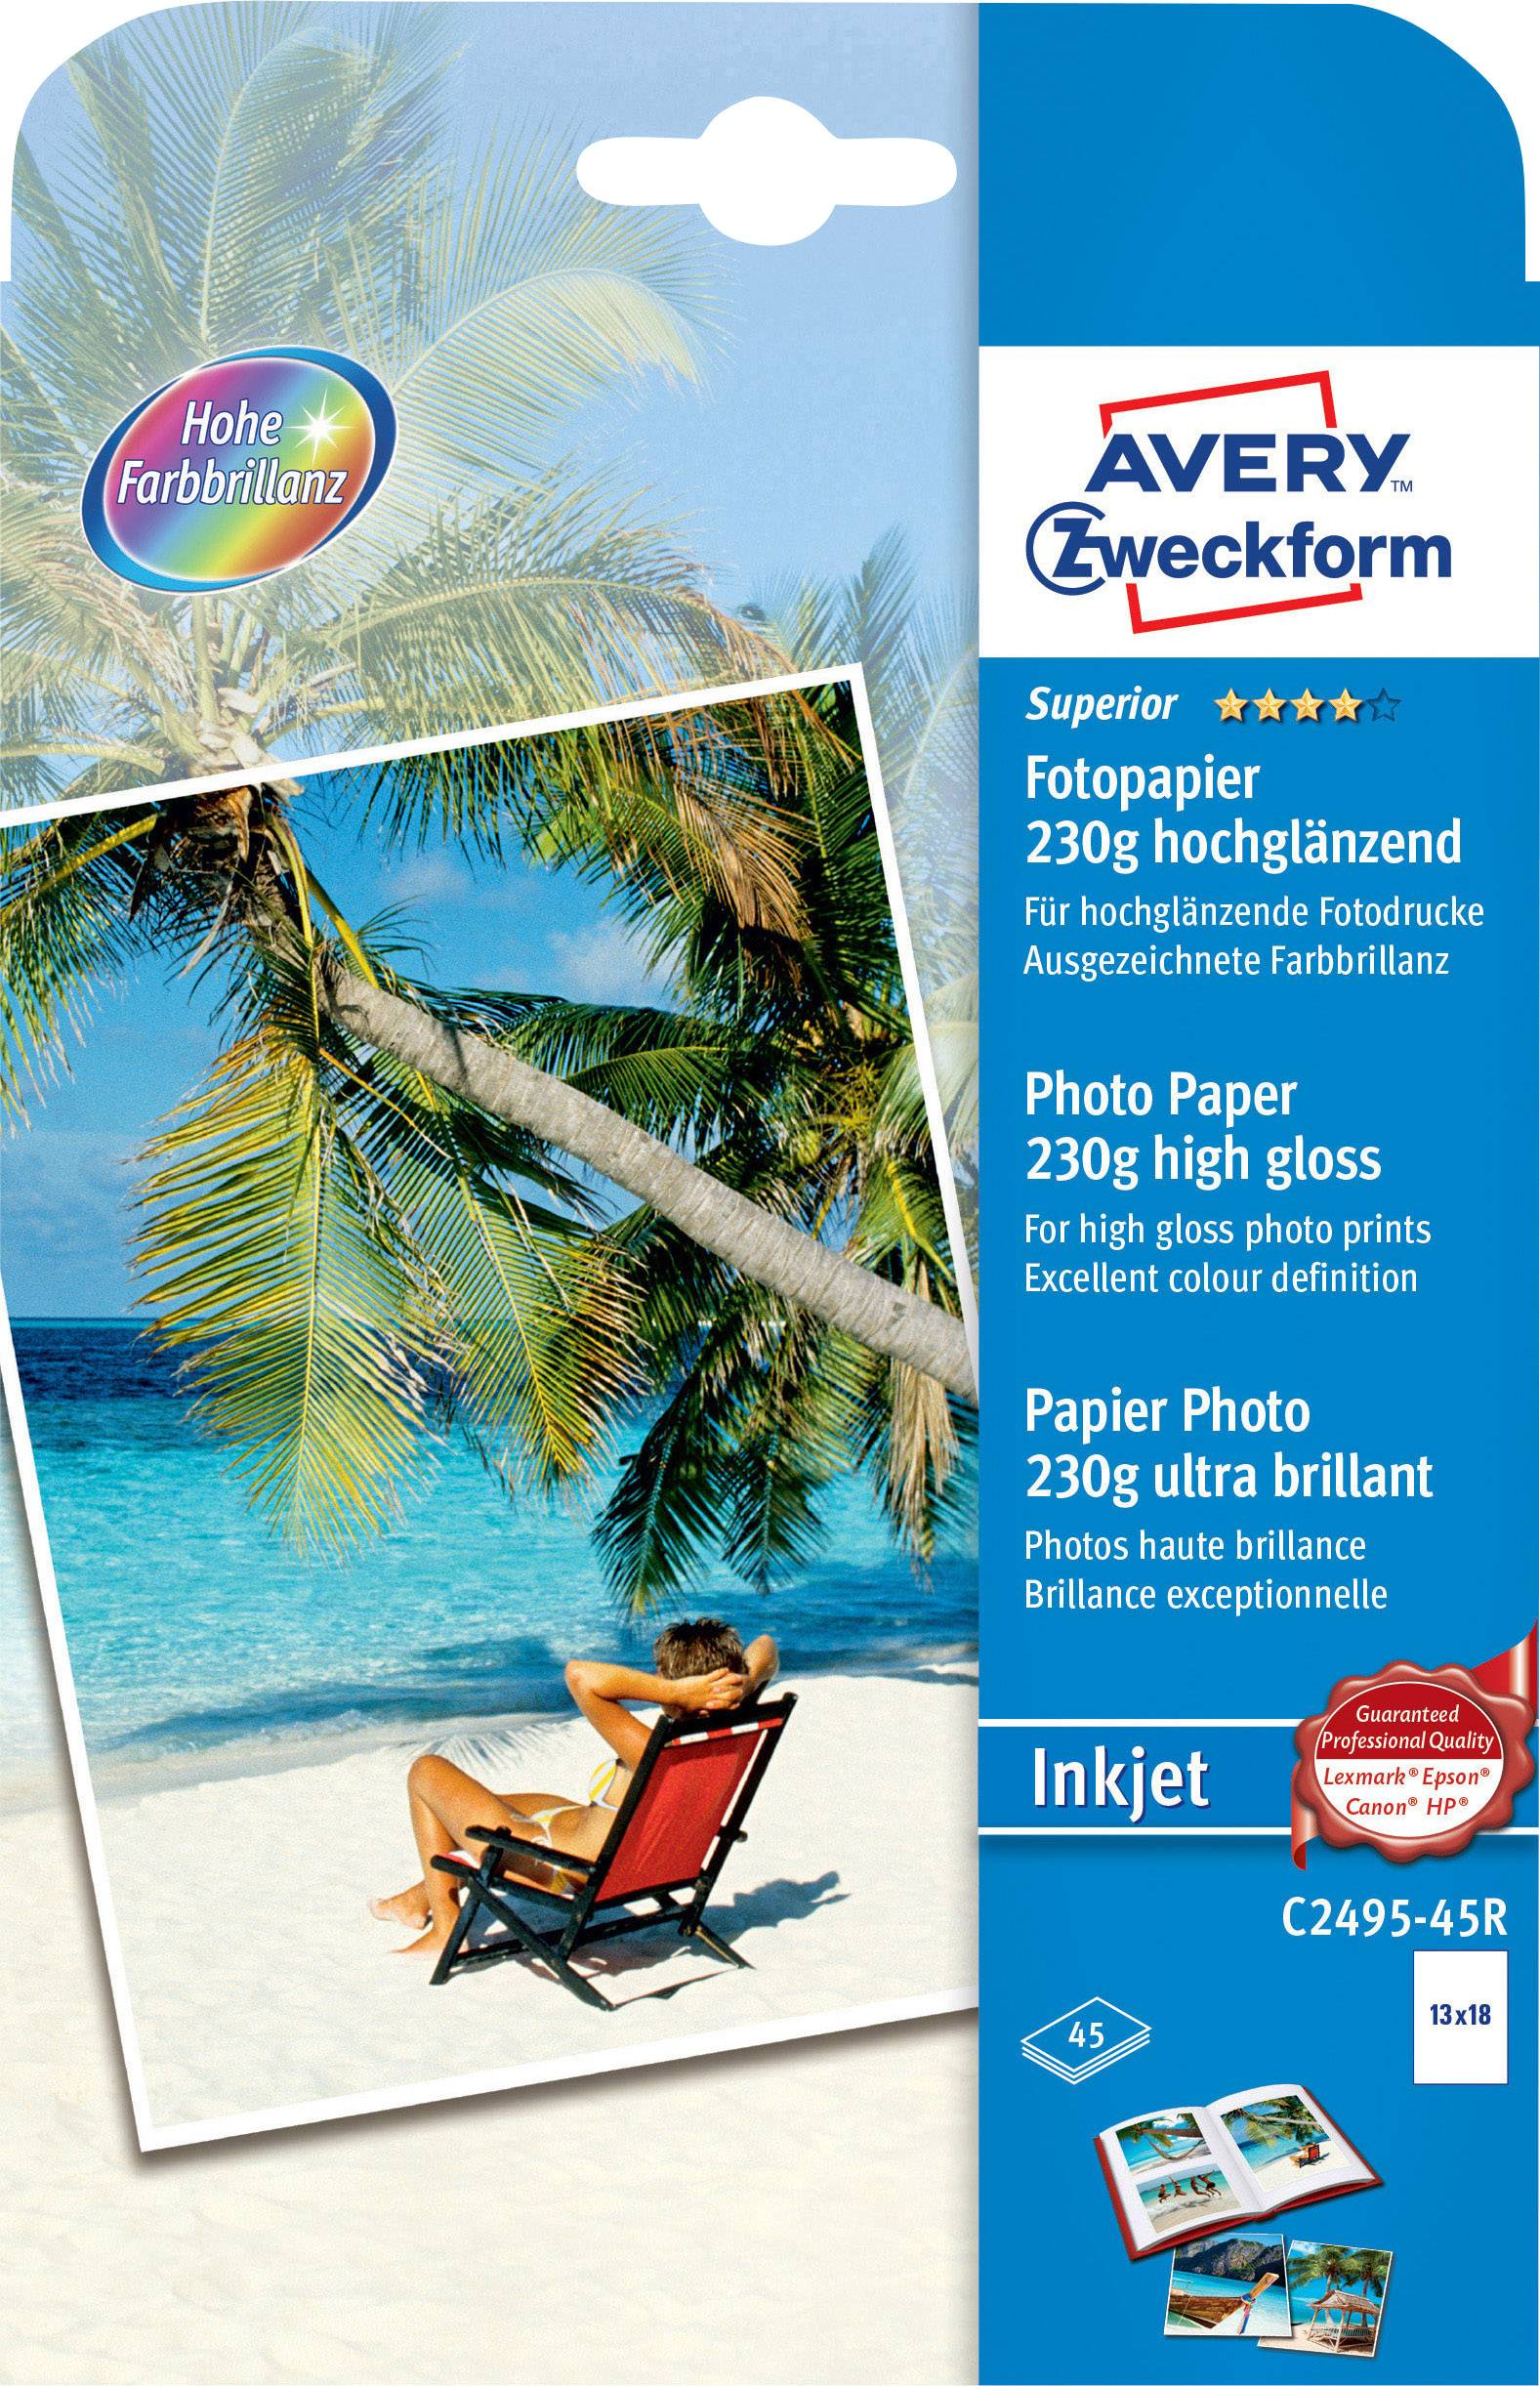 Fotopapír Avery-Zweckform Superior Inkjet C2495-45R, 13 x 18, 230 g/m², 45 listů